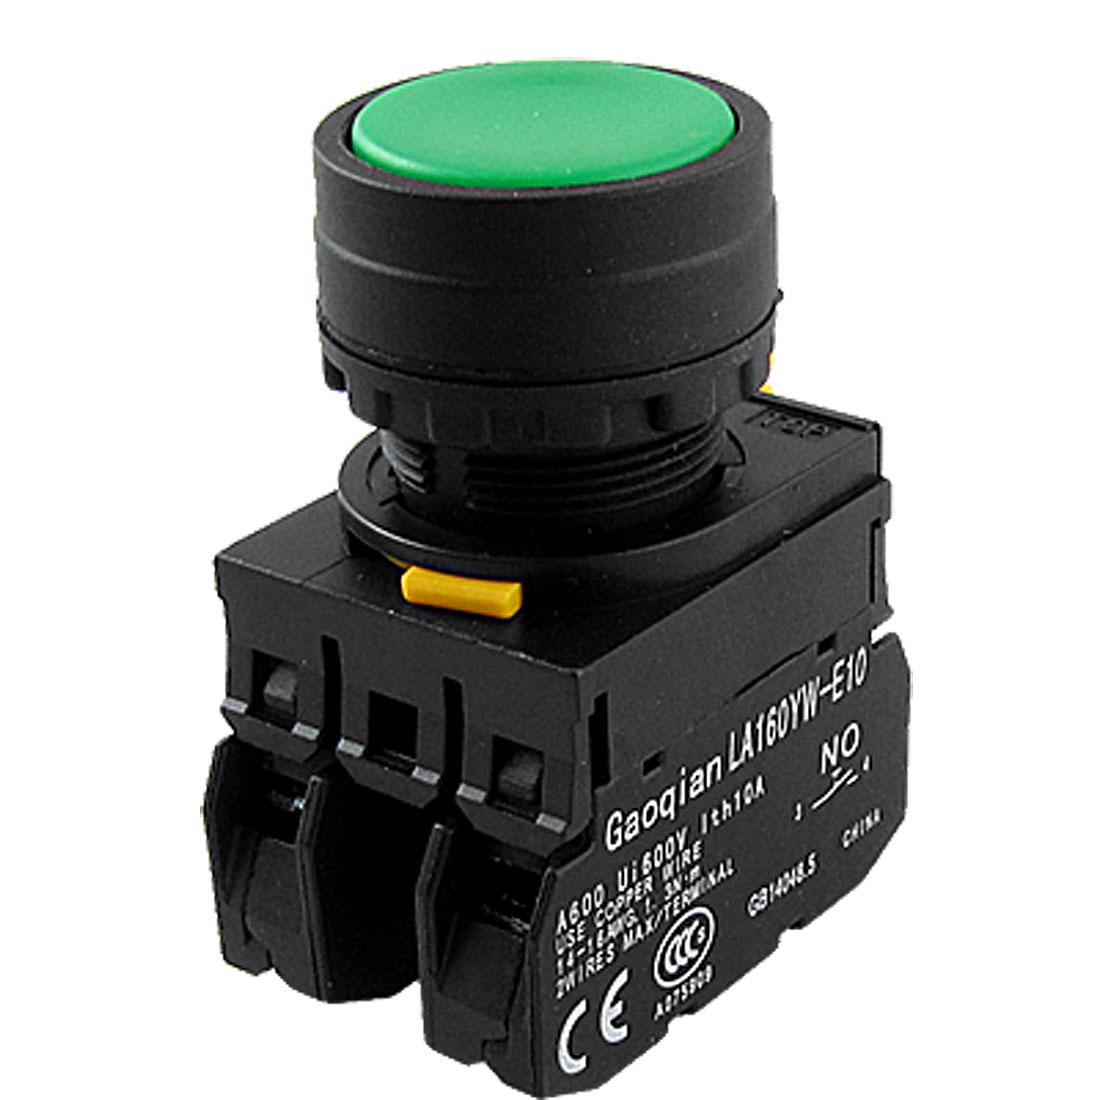 1 NO 1 NC Green Sign Signal Latching Push Button Switch Lock 22mm YW1B-A1E11PG